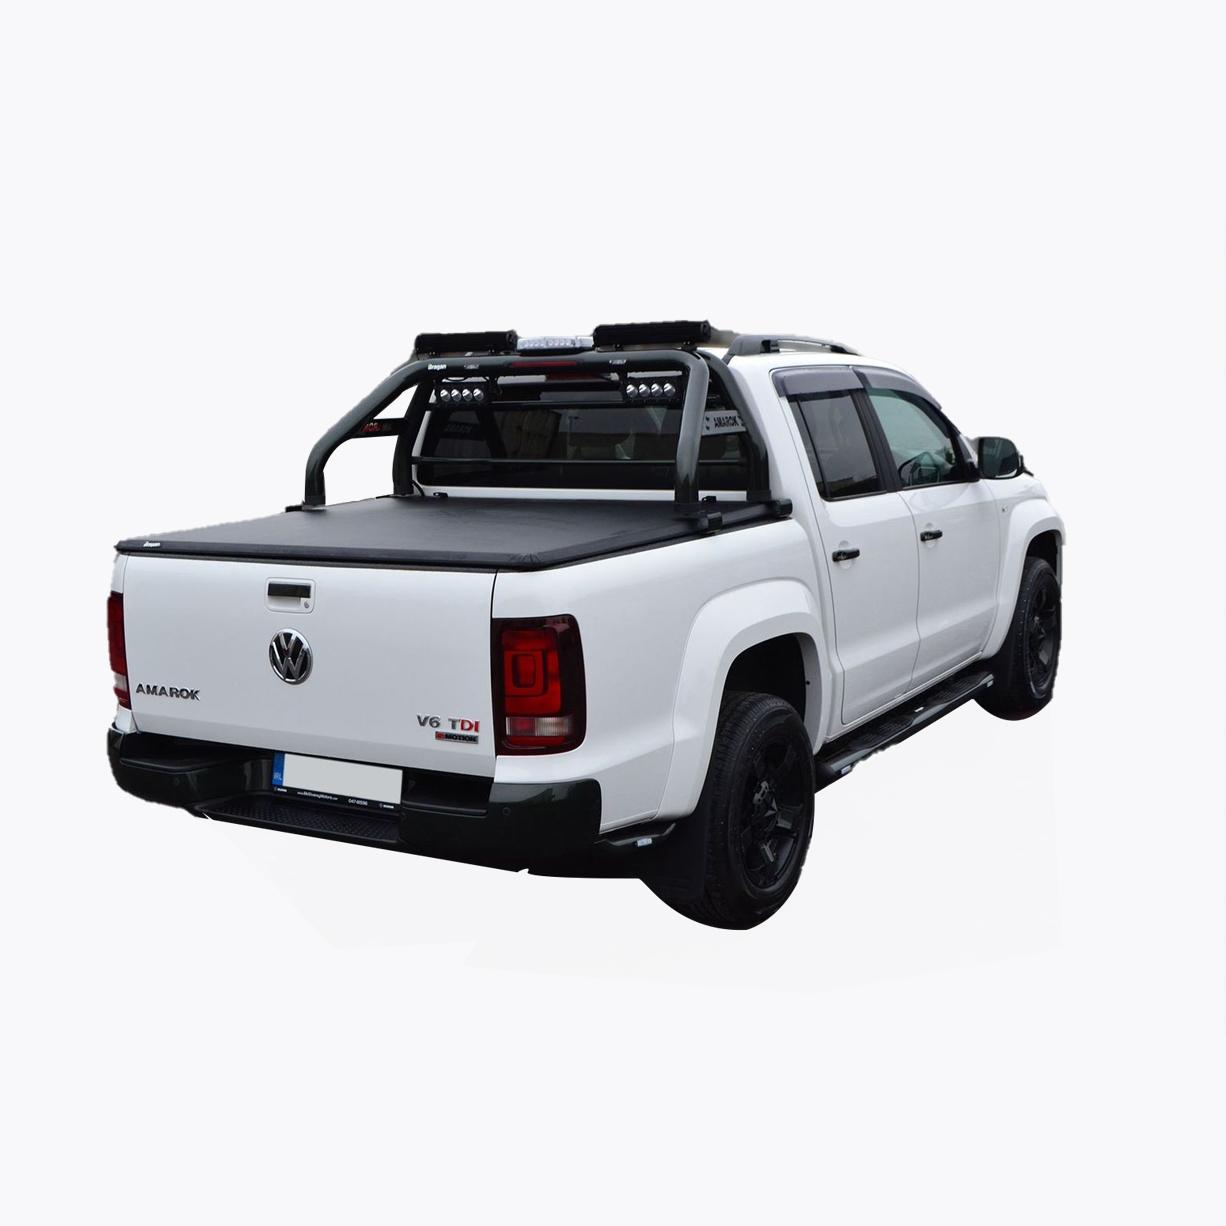 VW amarok soft tri fold tonneau cover